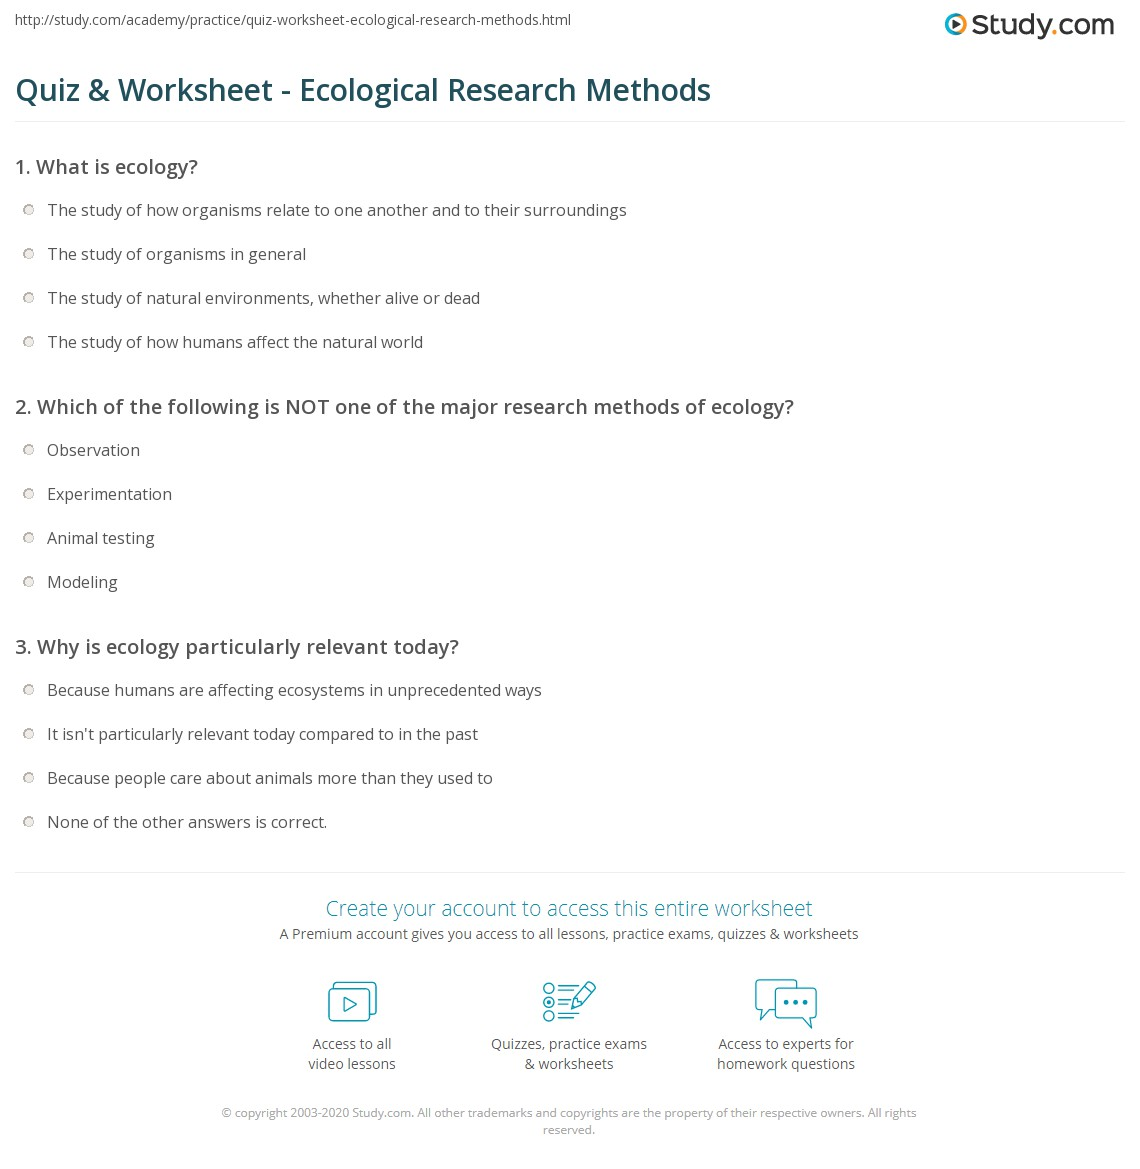 Printables Principles Of Ecology Worksheet Answers principles of ecology worksheet answers vintagegrn chapter 13 intrepidpath